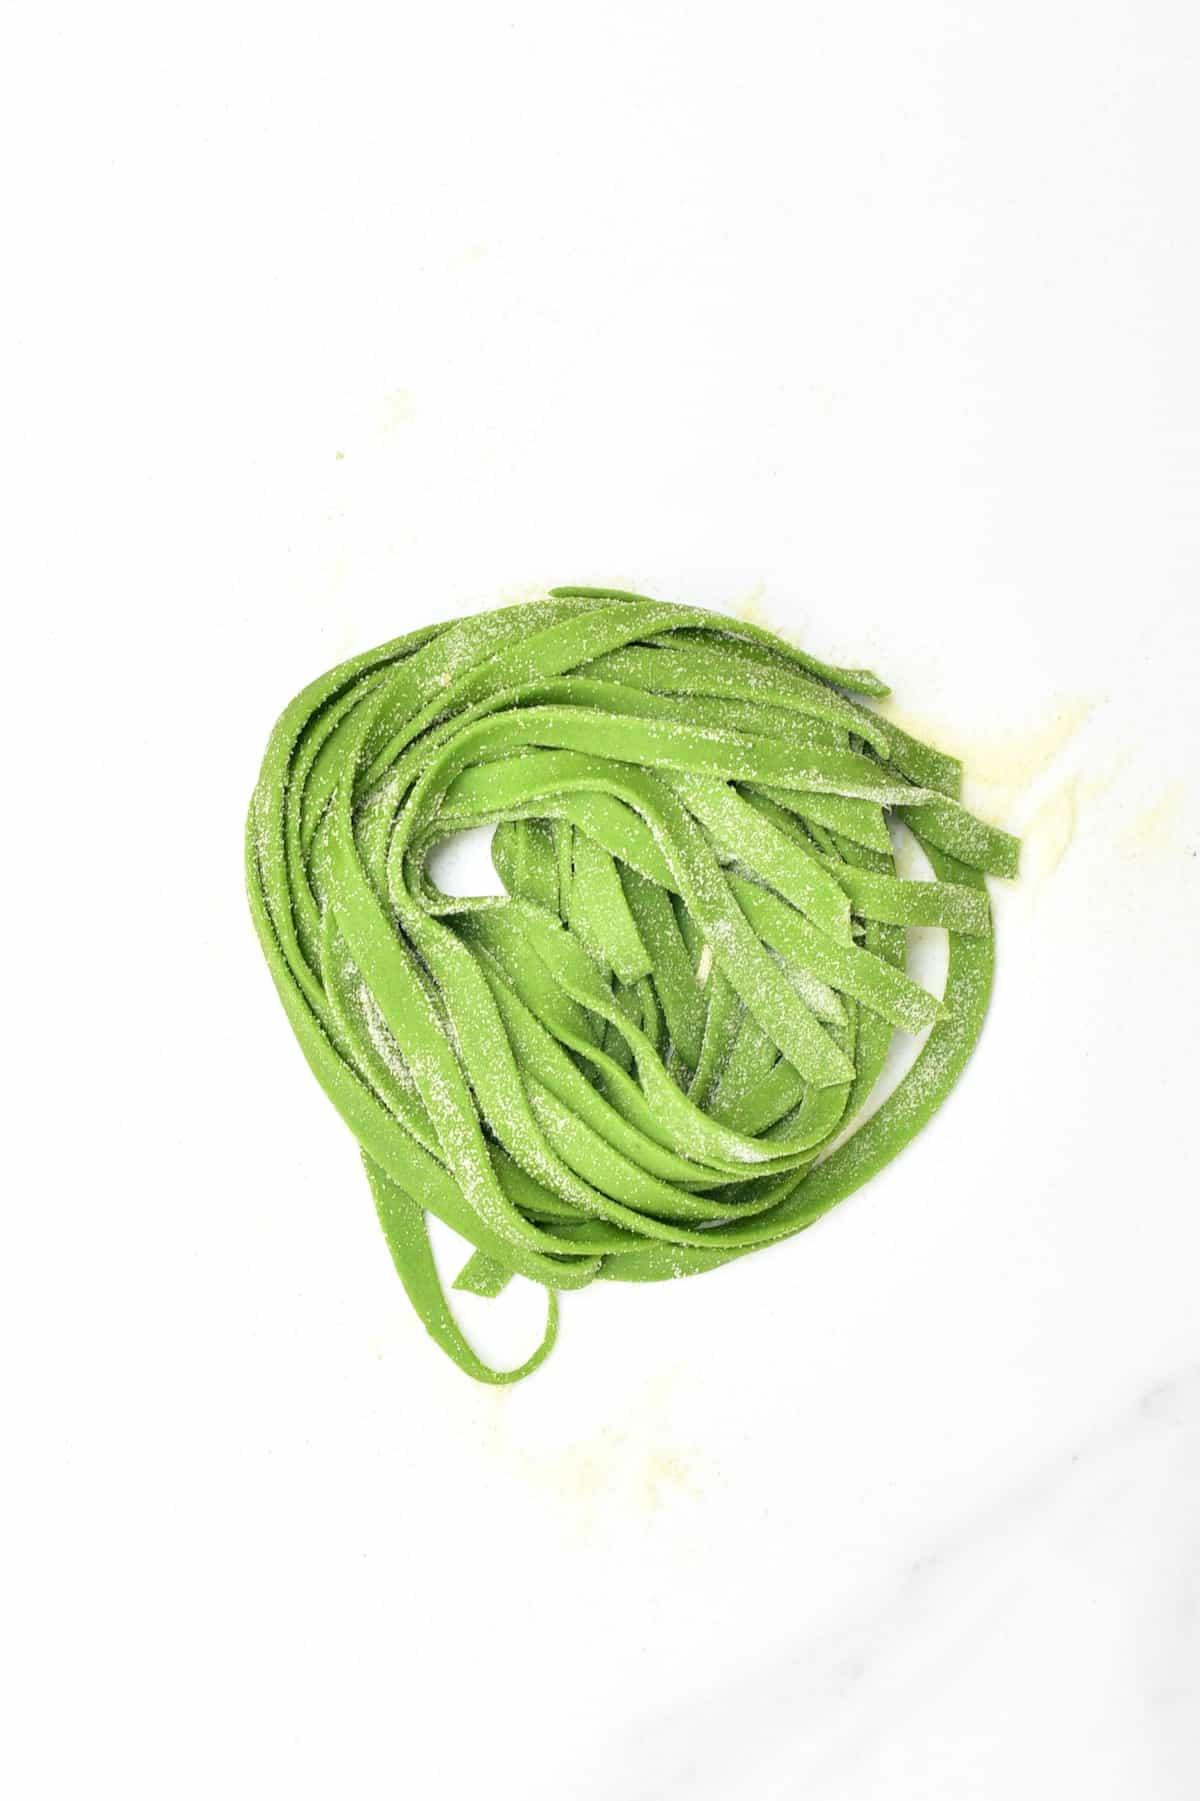 Spinach Tagliatelle made into a nest